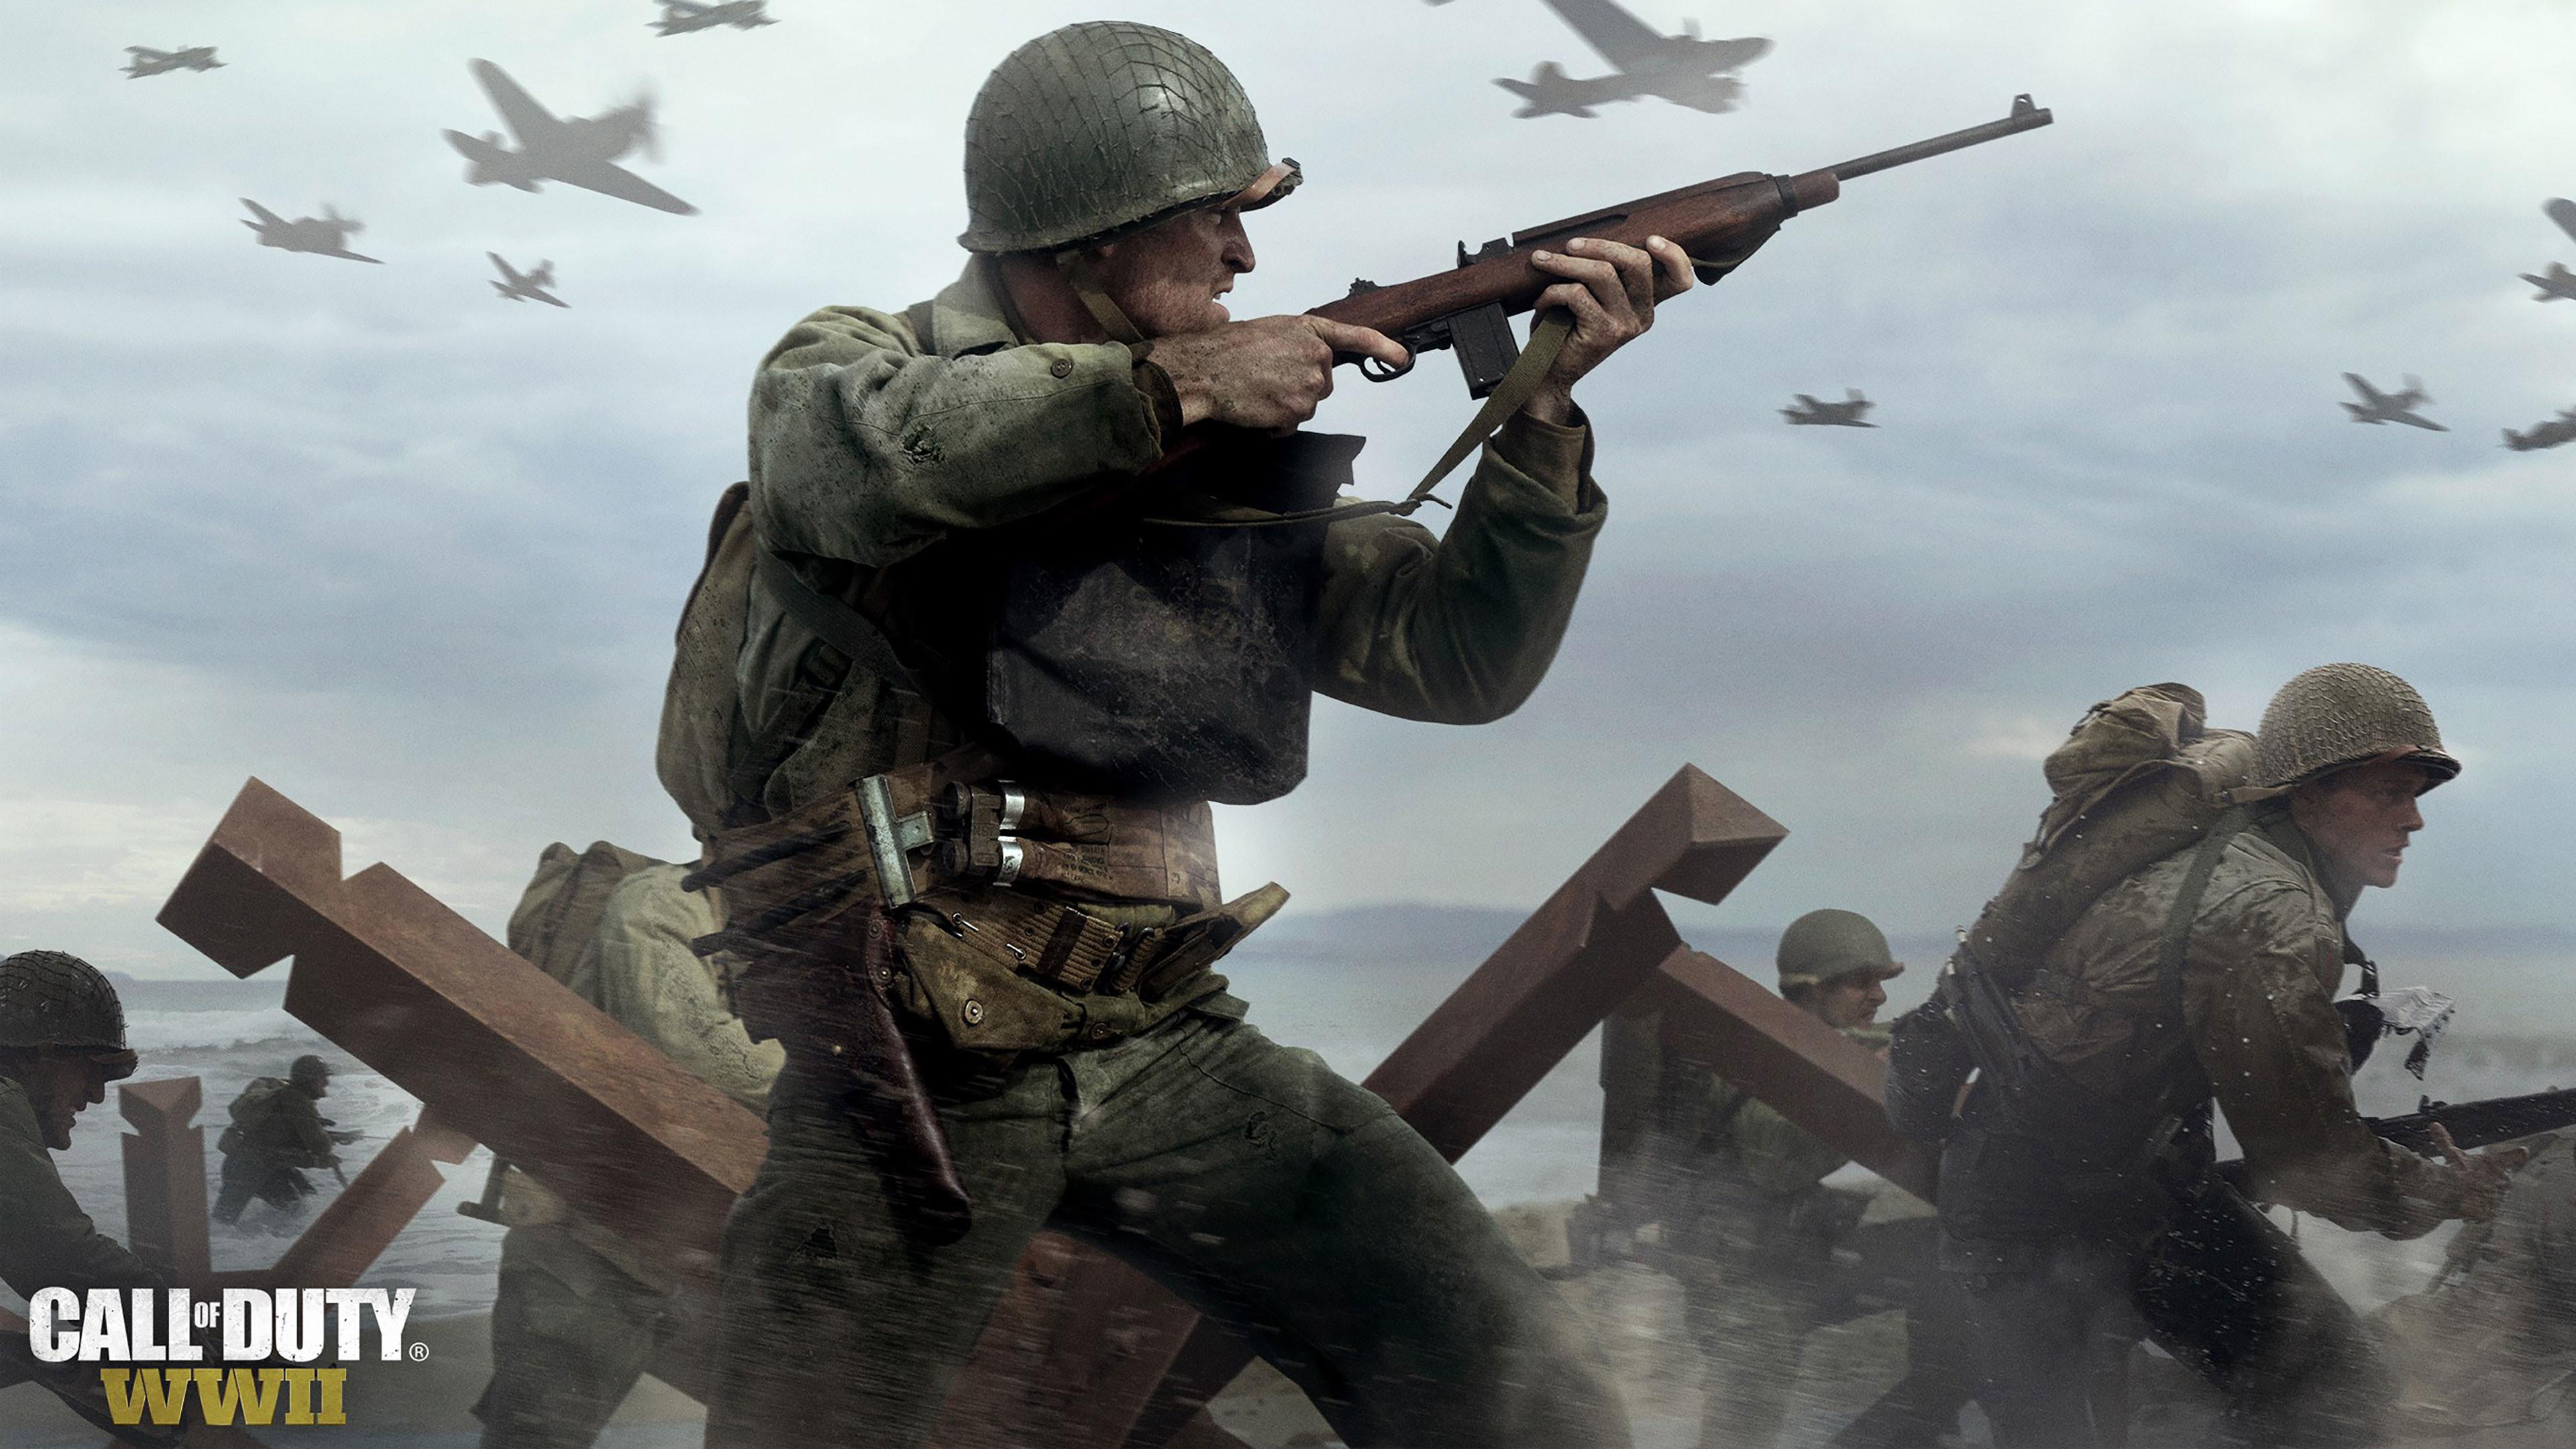 CALL OF DUTY WWII 4K Wallpaper …